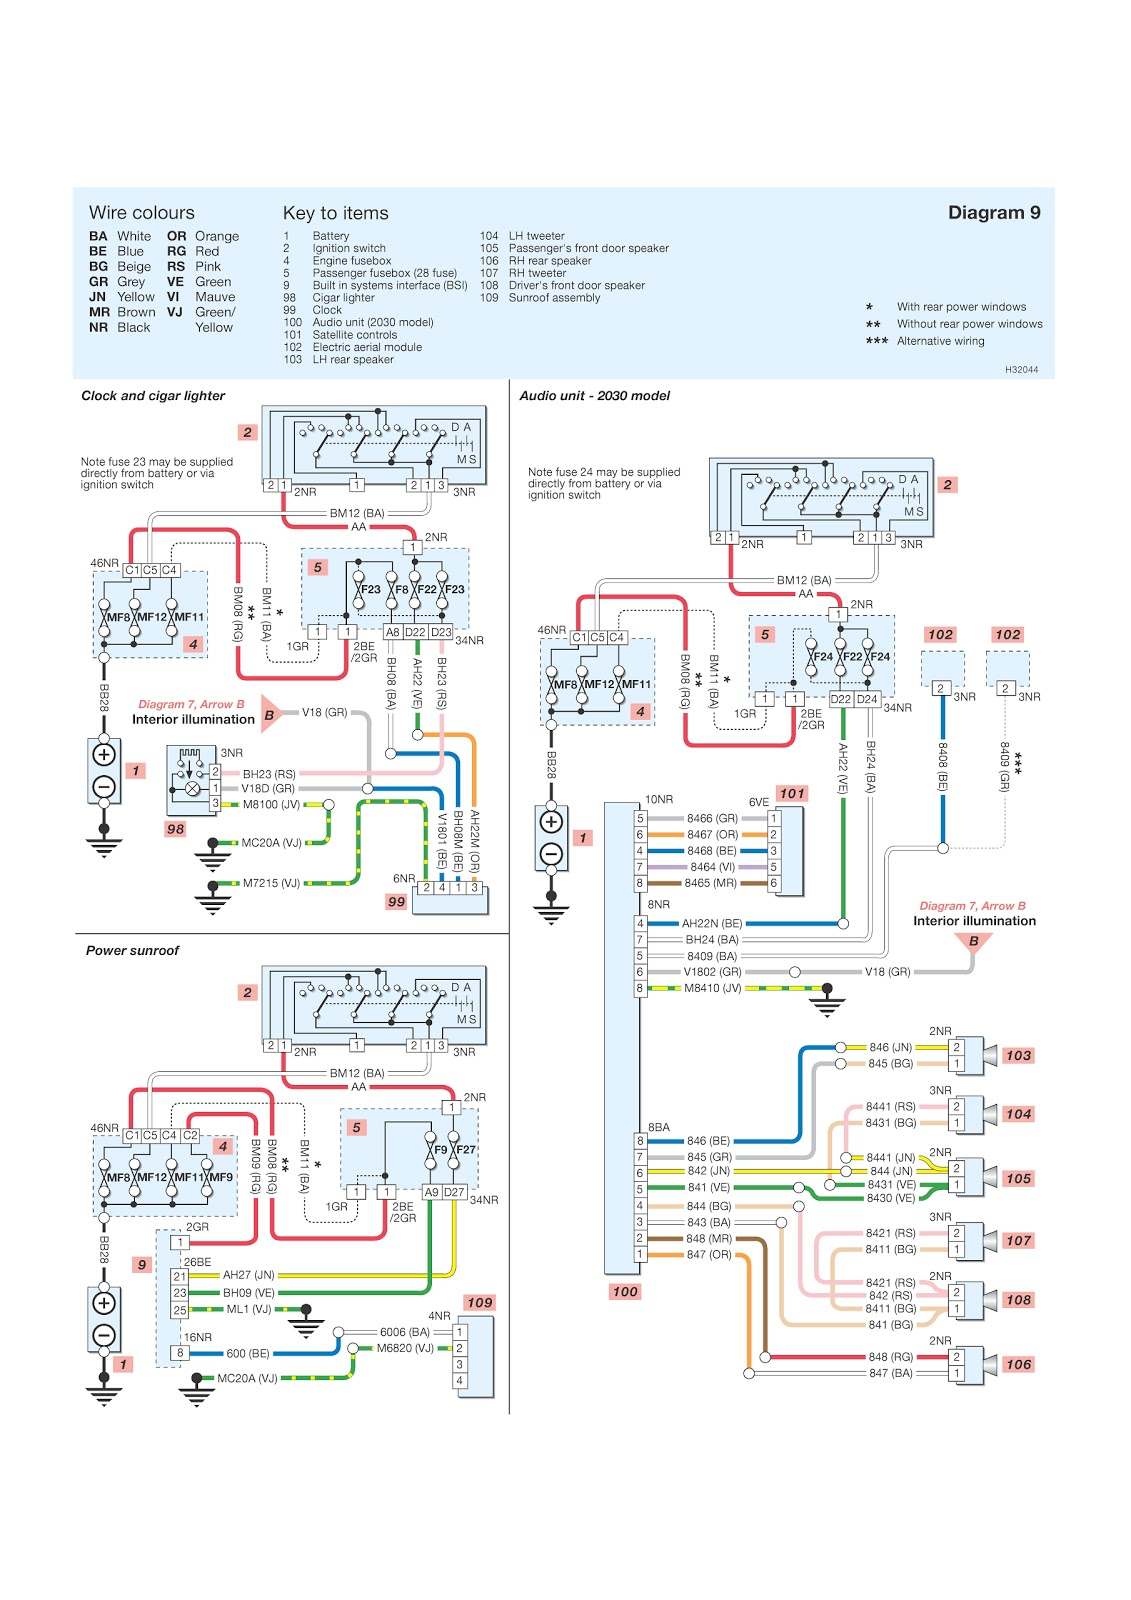 hight resolution of peugeot 206 system wiring diagrams clock cigar lighter